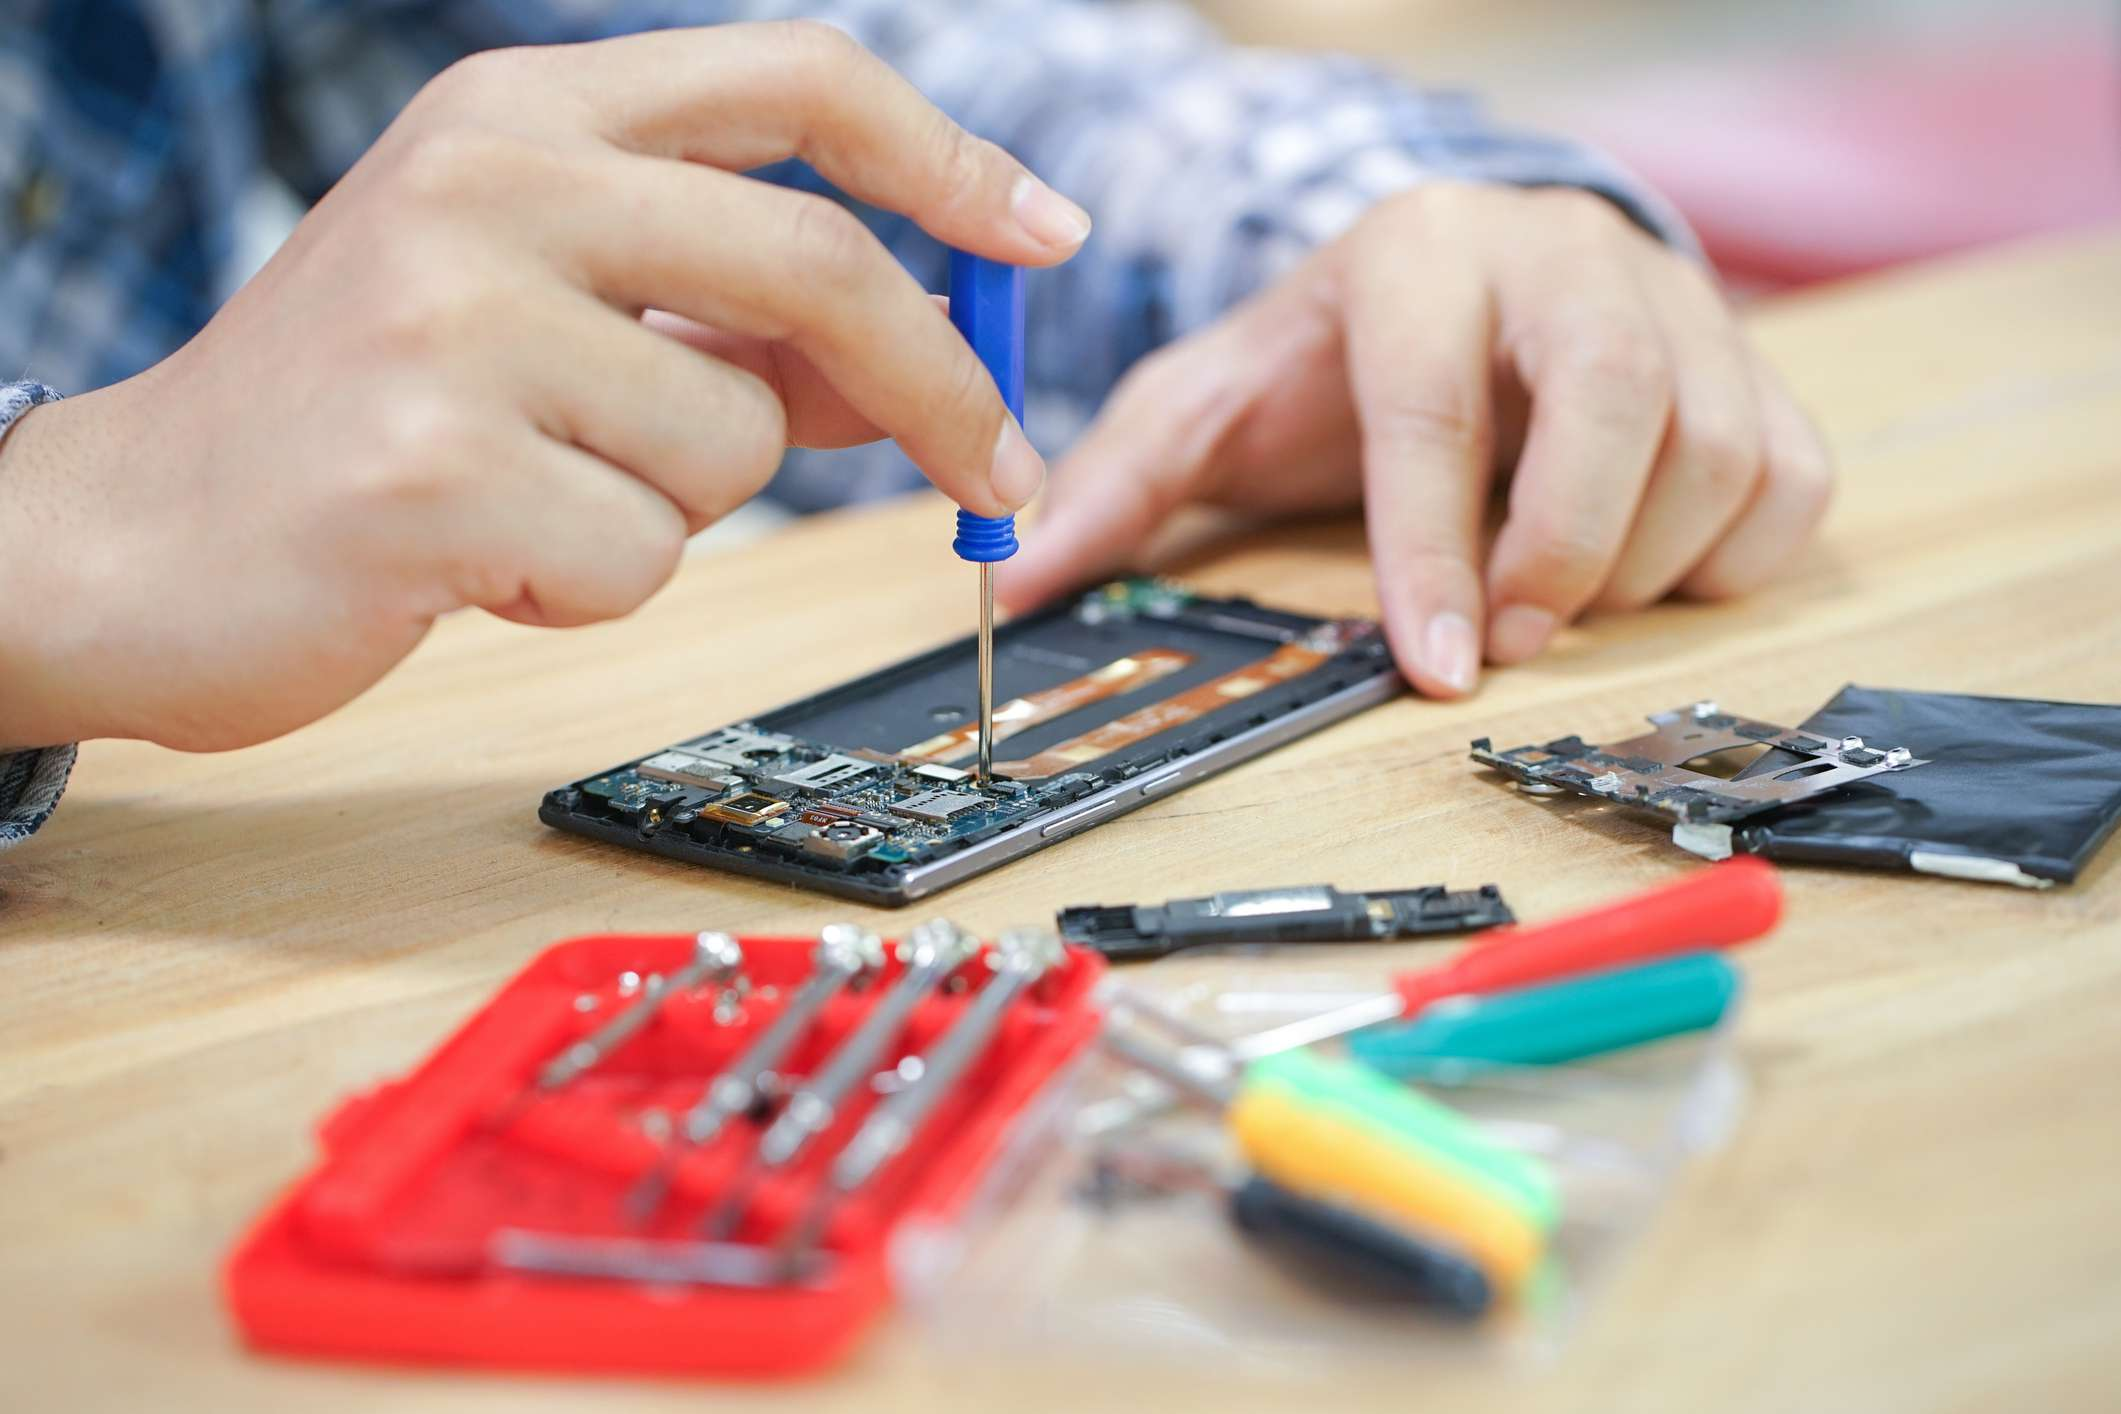 Someone repairing a cellphone.